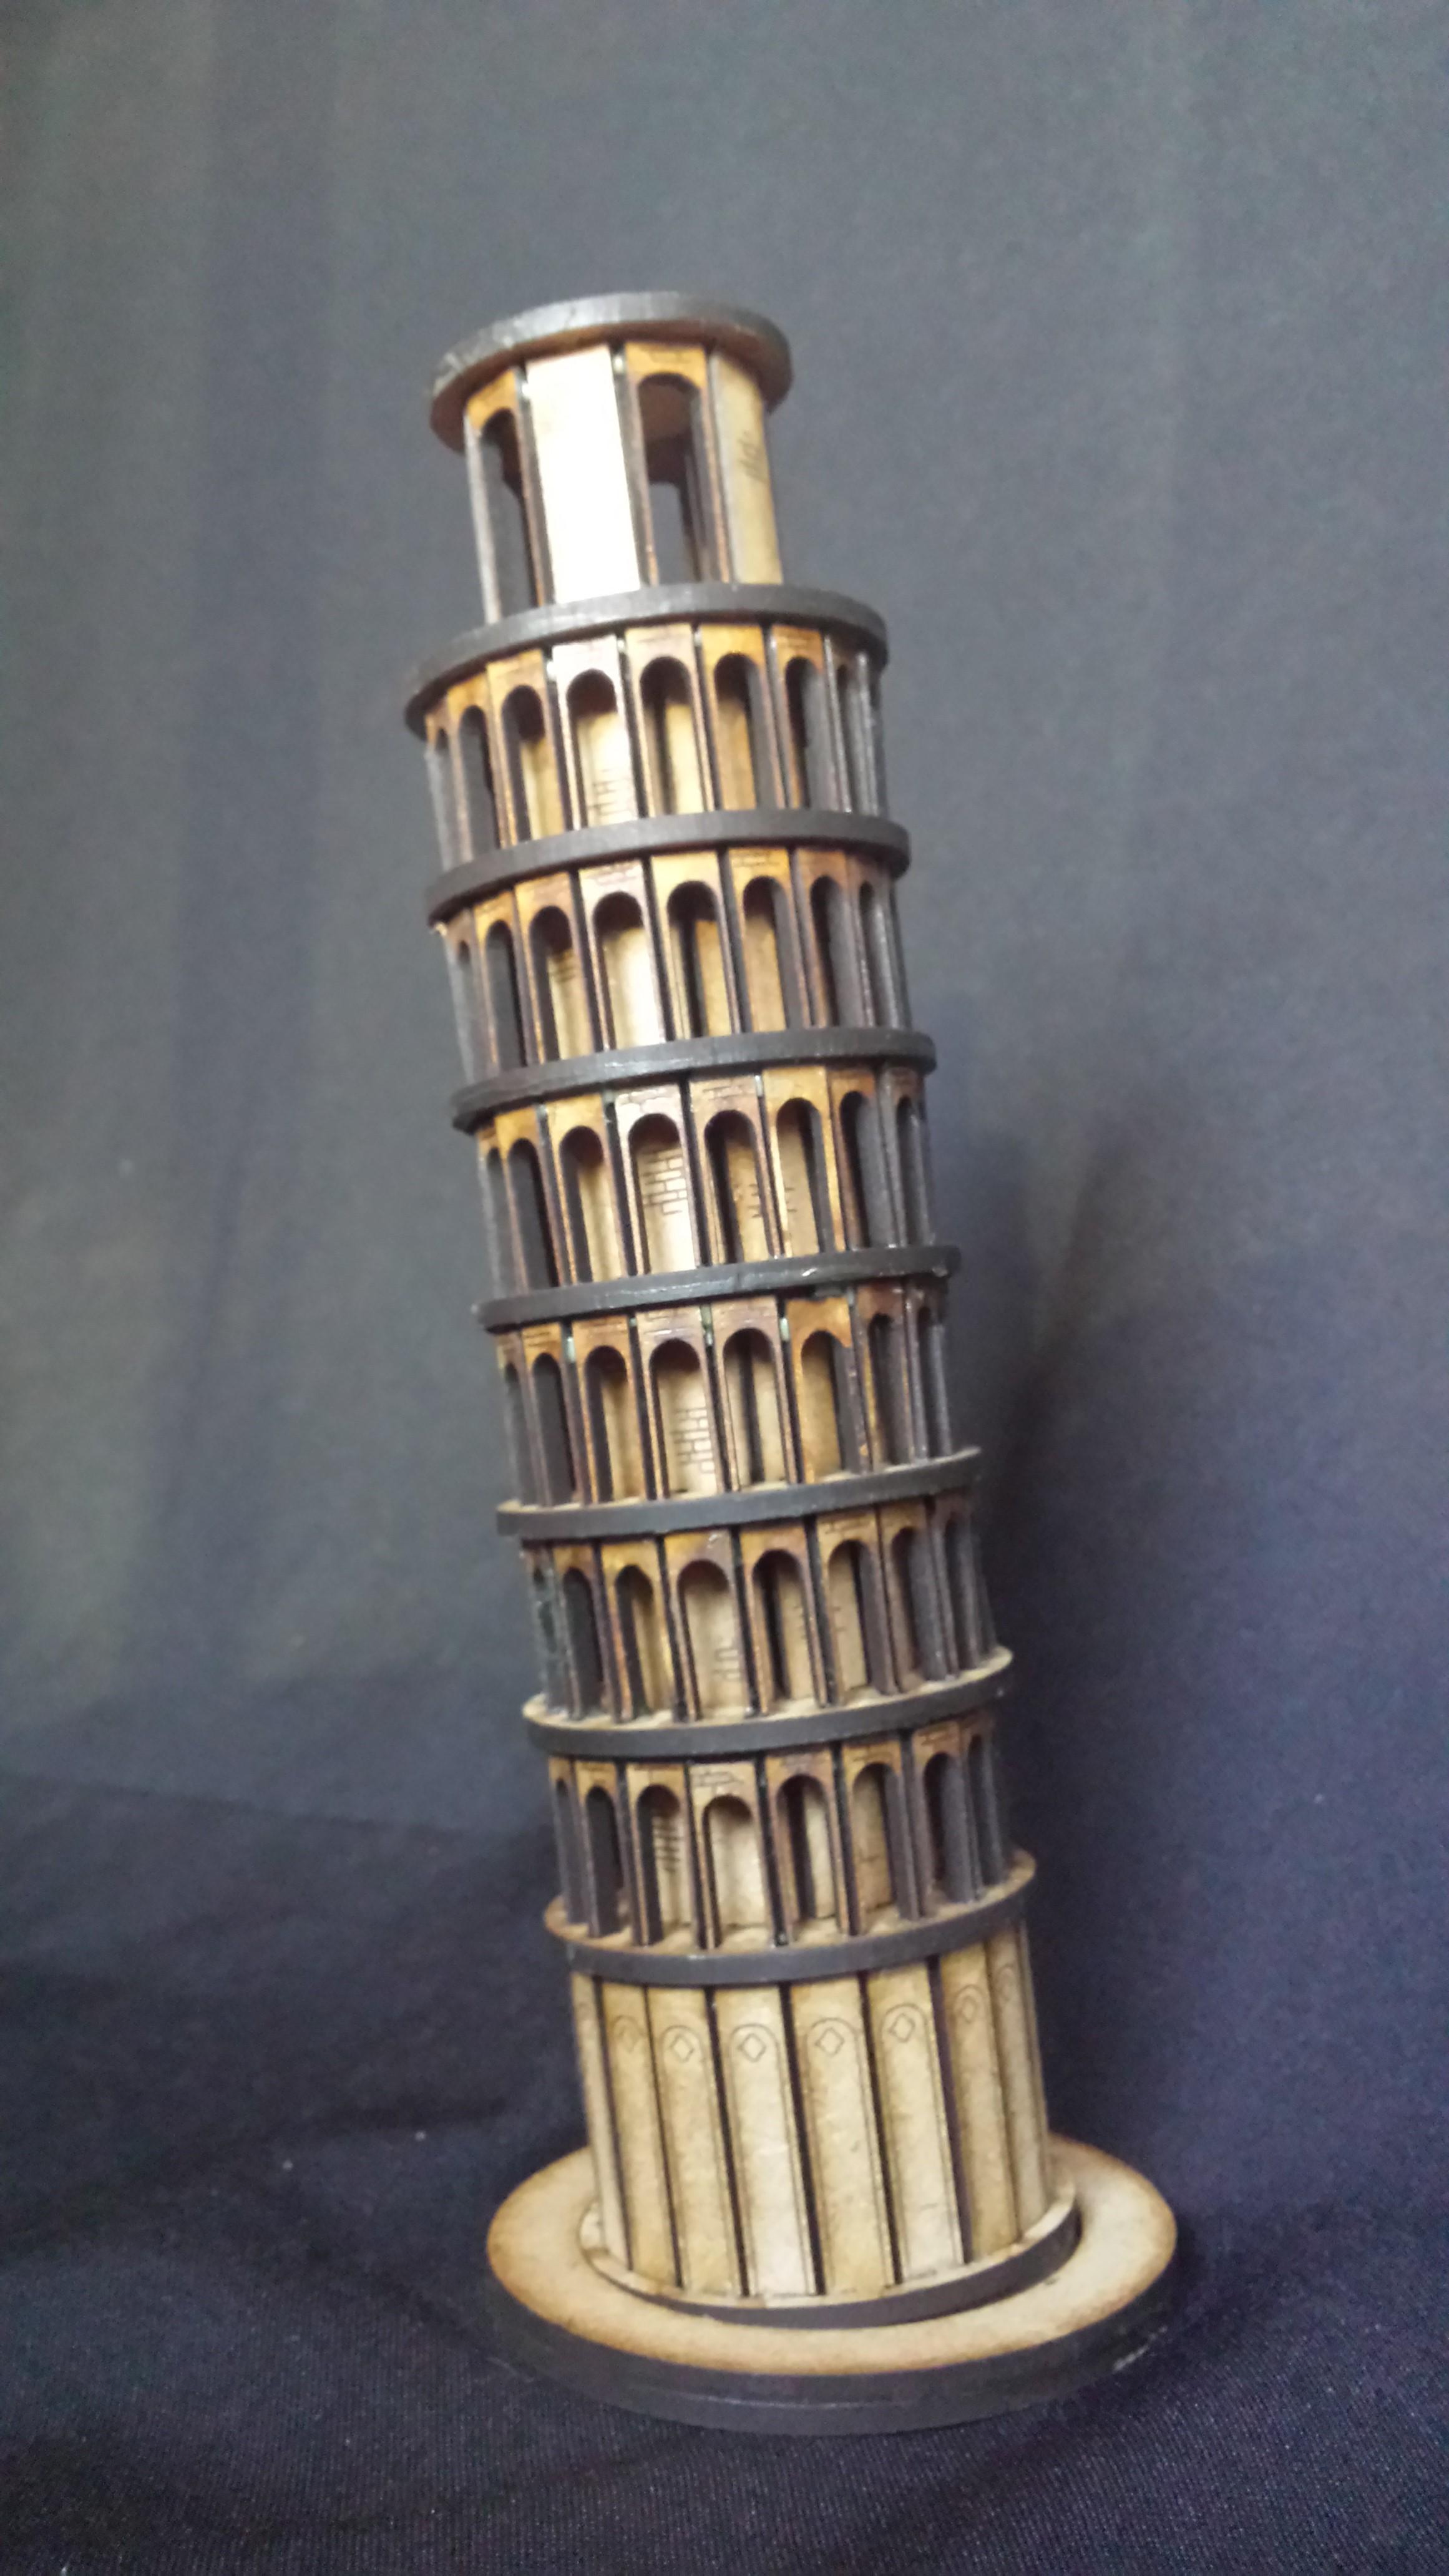 TOWER OF PIZA.jpg